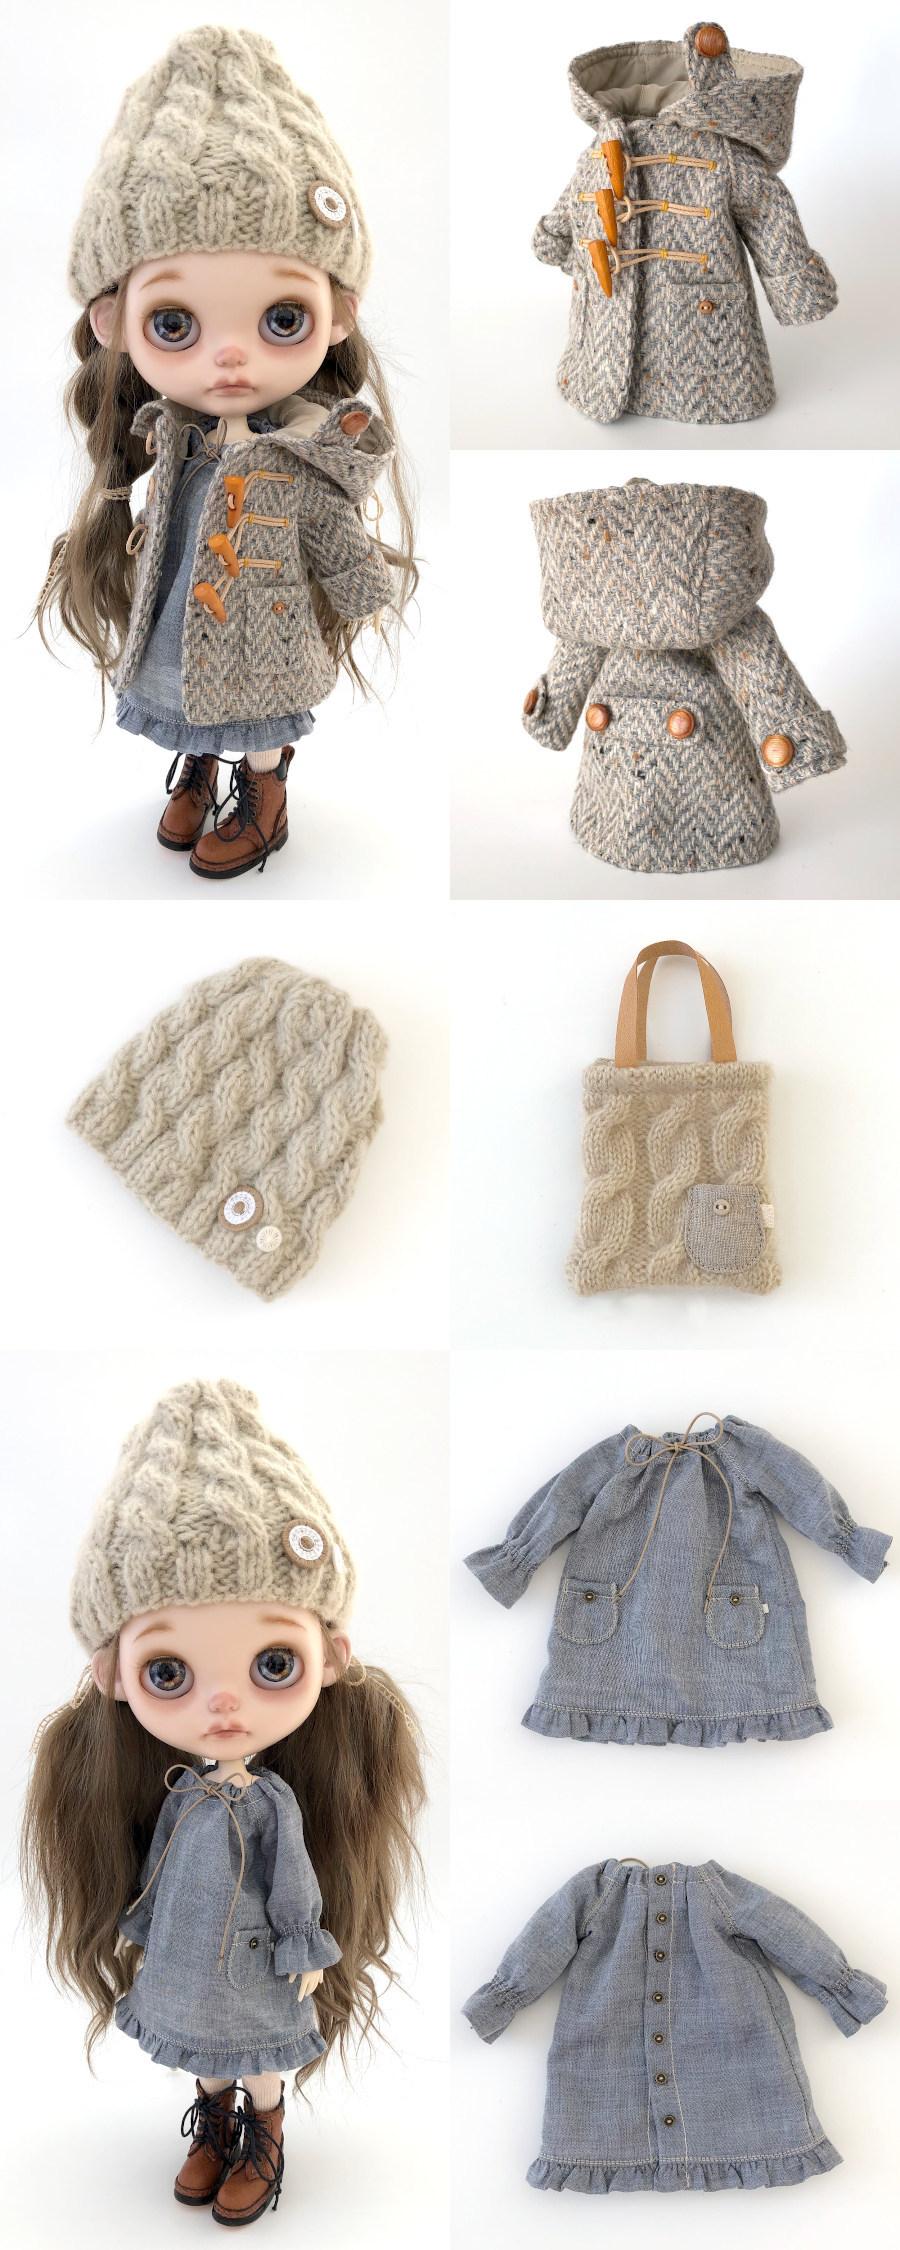 *lucalily * dolls clothes* Herringbone duffle coat set *_d0217189_19101810.jpg